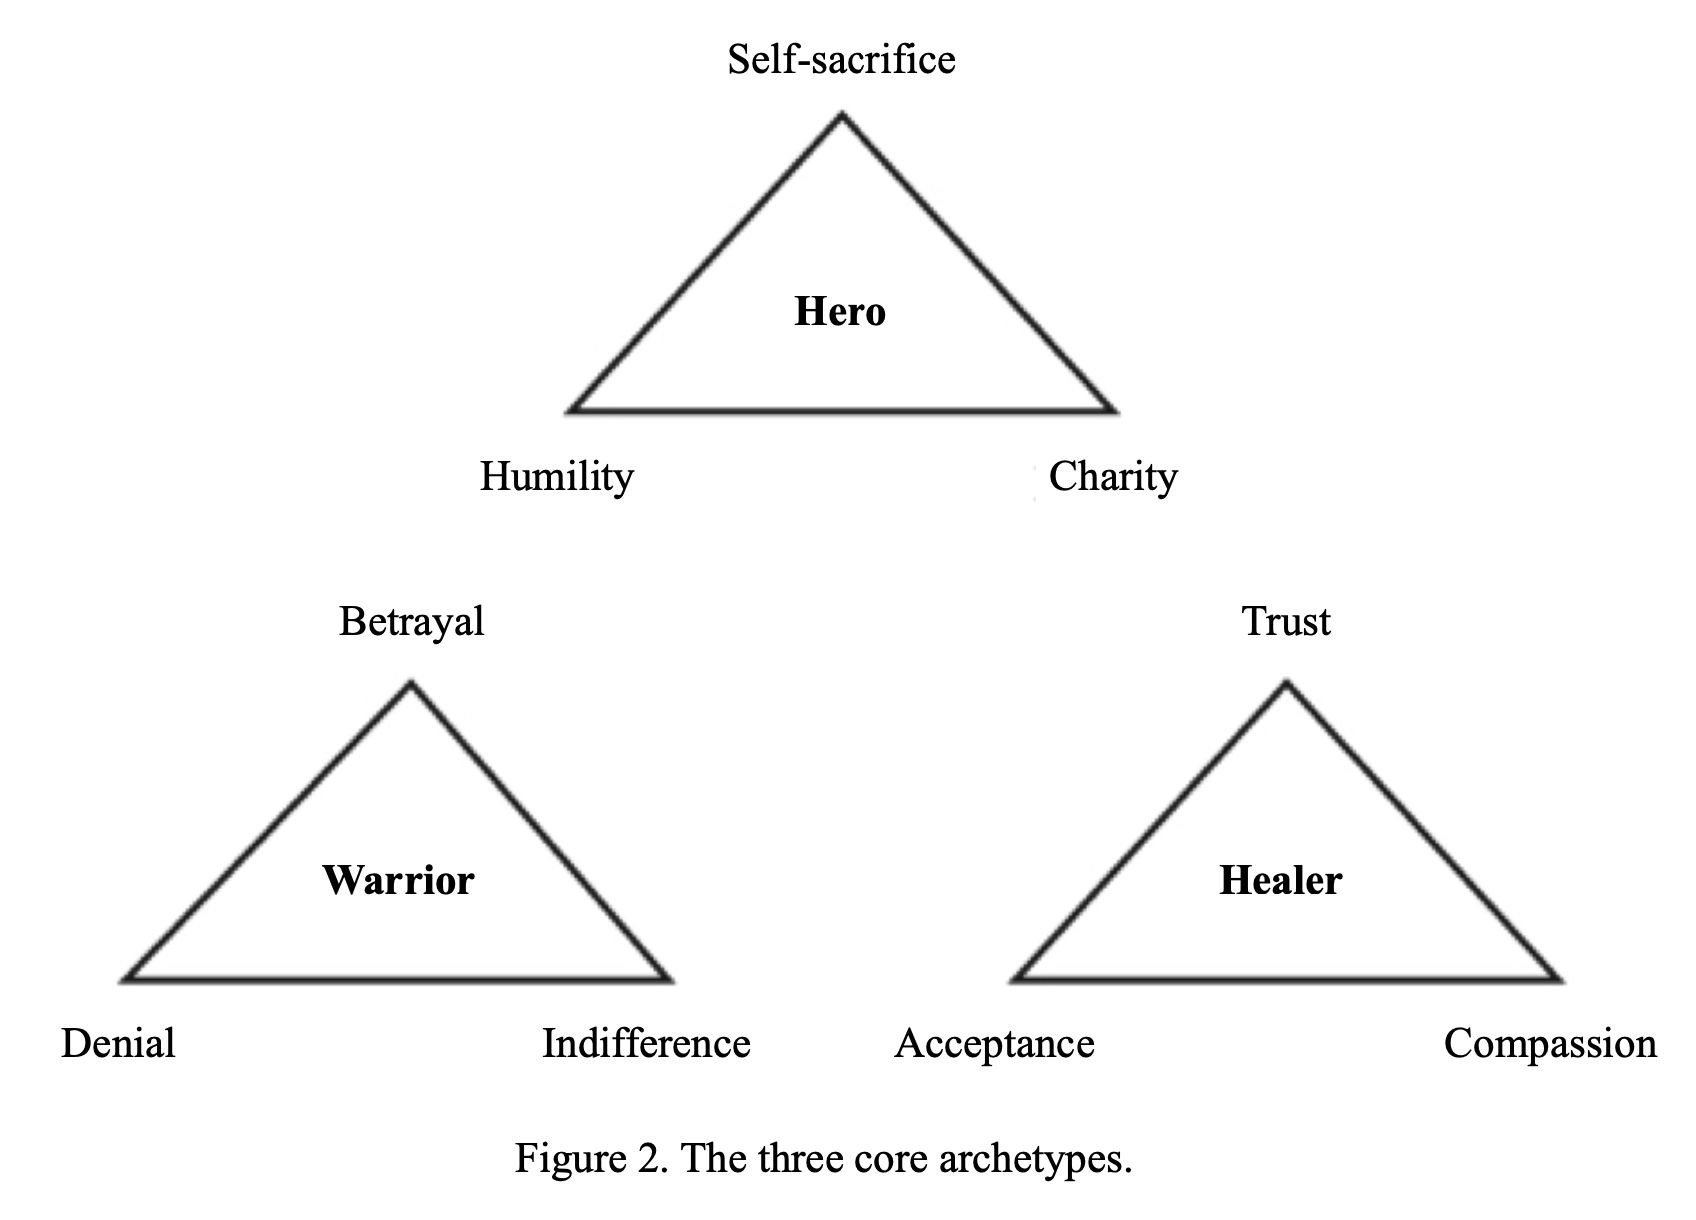 The three core archetypes